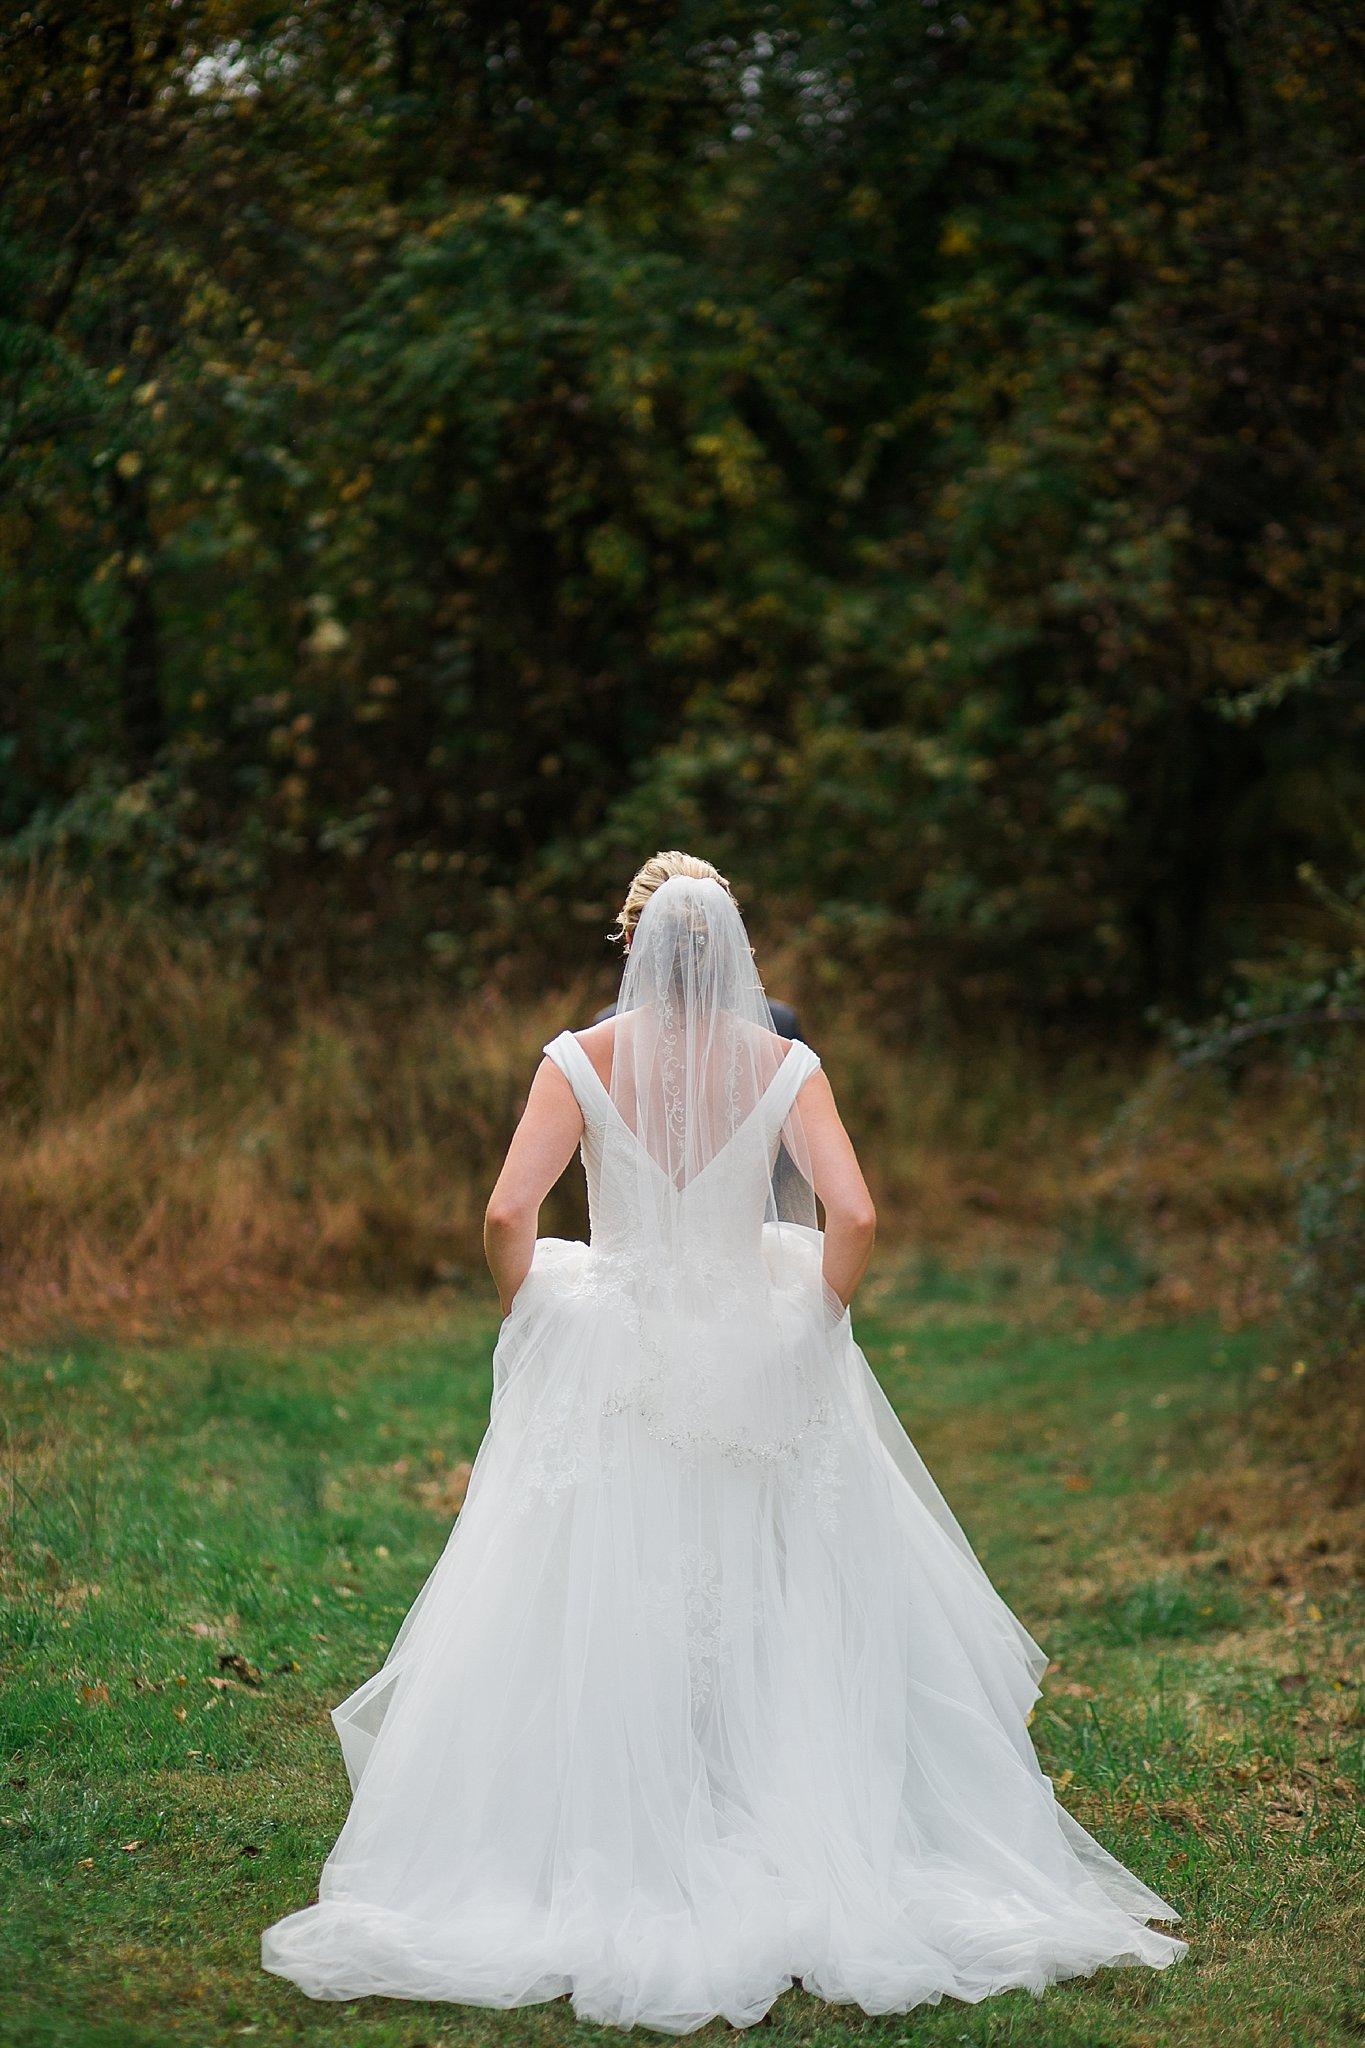 New Windsor New York Hudson Valley New York Wedding Photographer 16.jpg